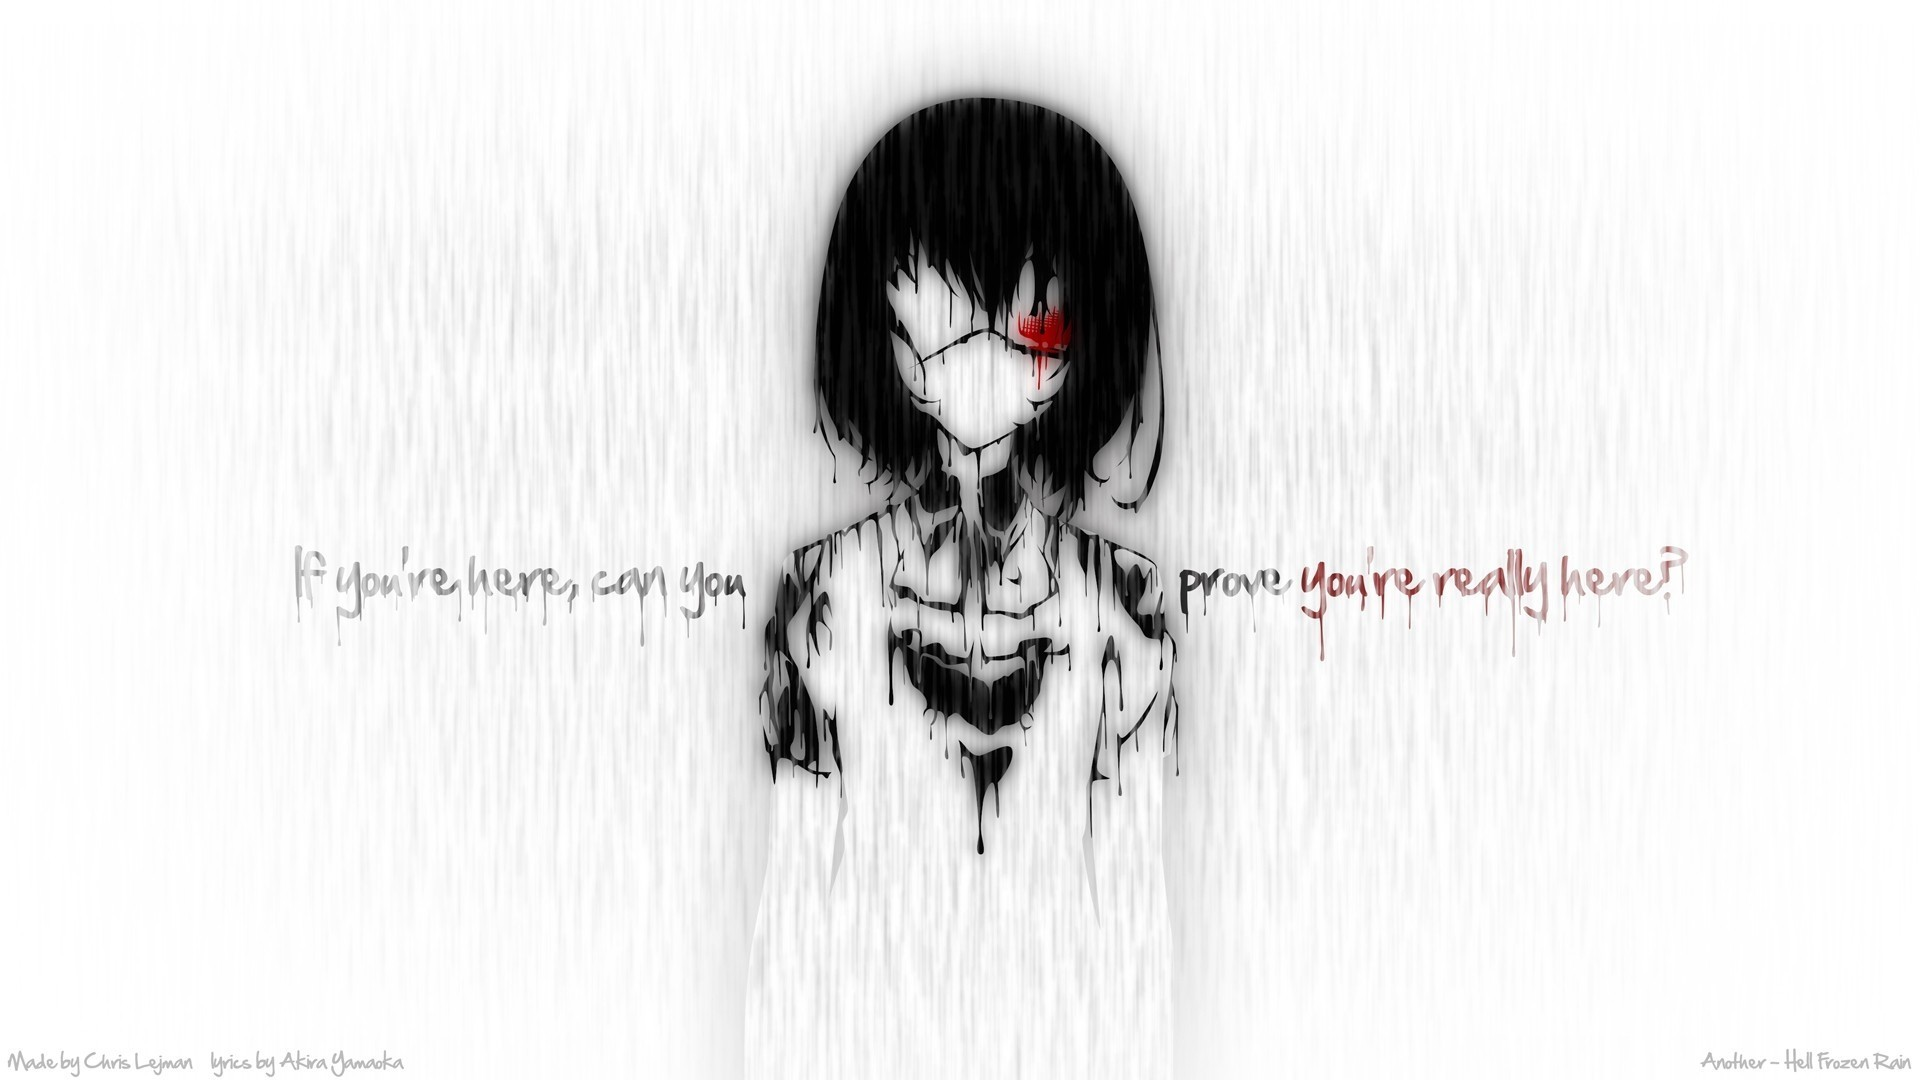 Creepy rain blood quotes eyepatch typography anime anime girls another anime  series misaki mei bla Wallpaper